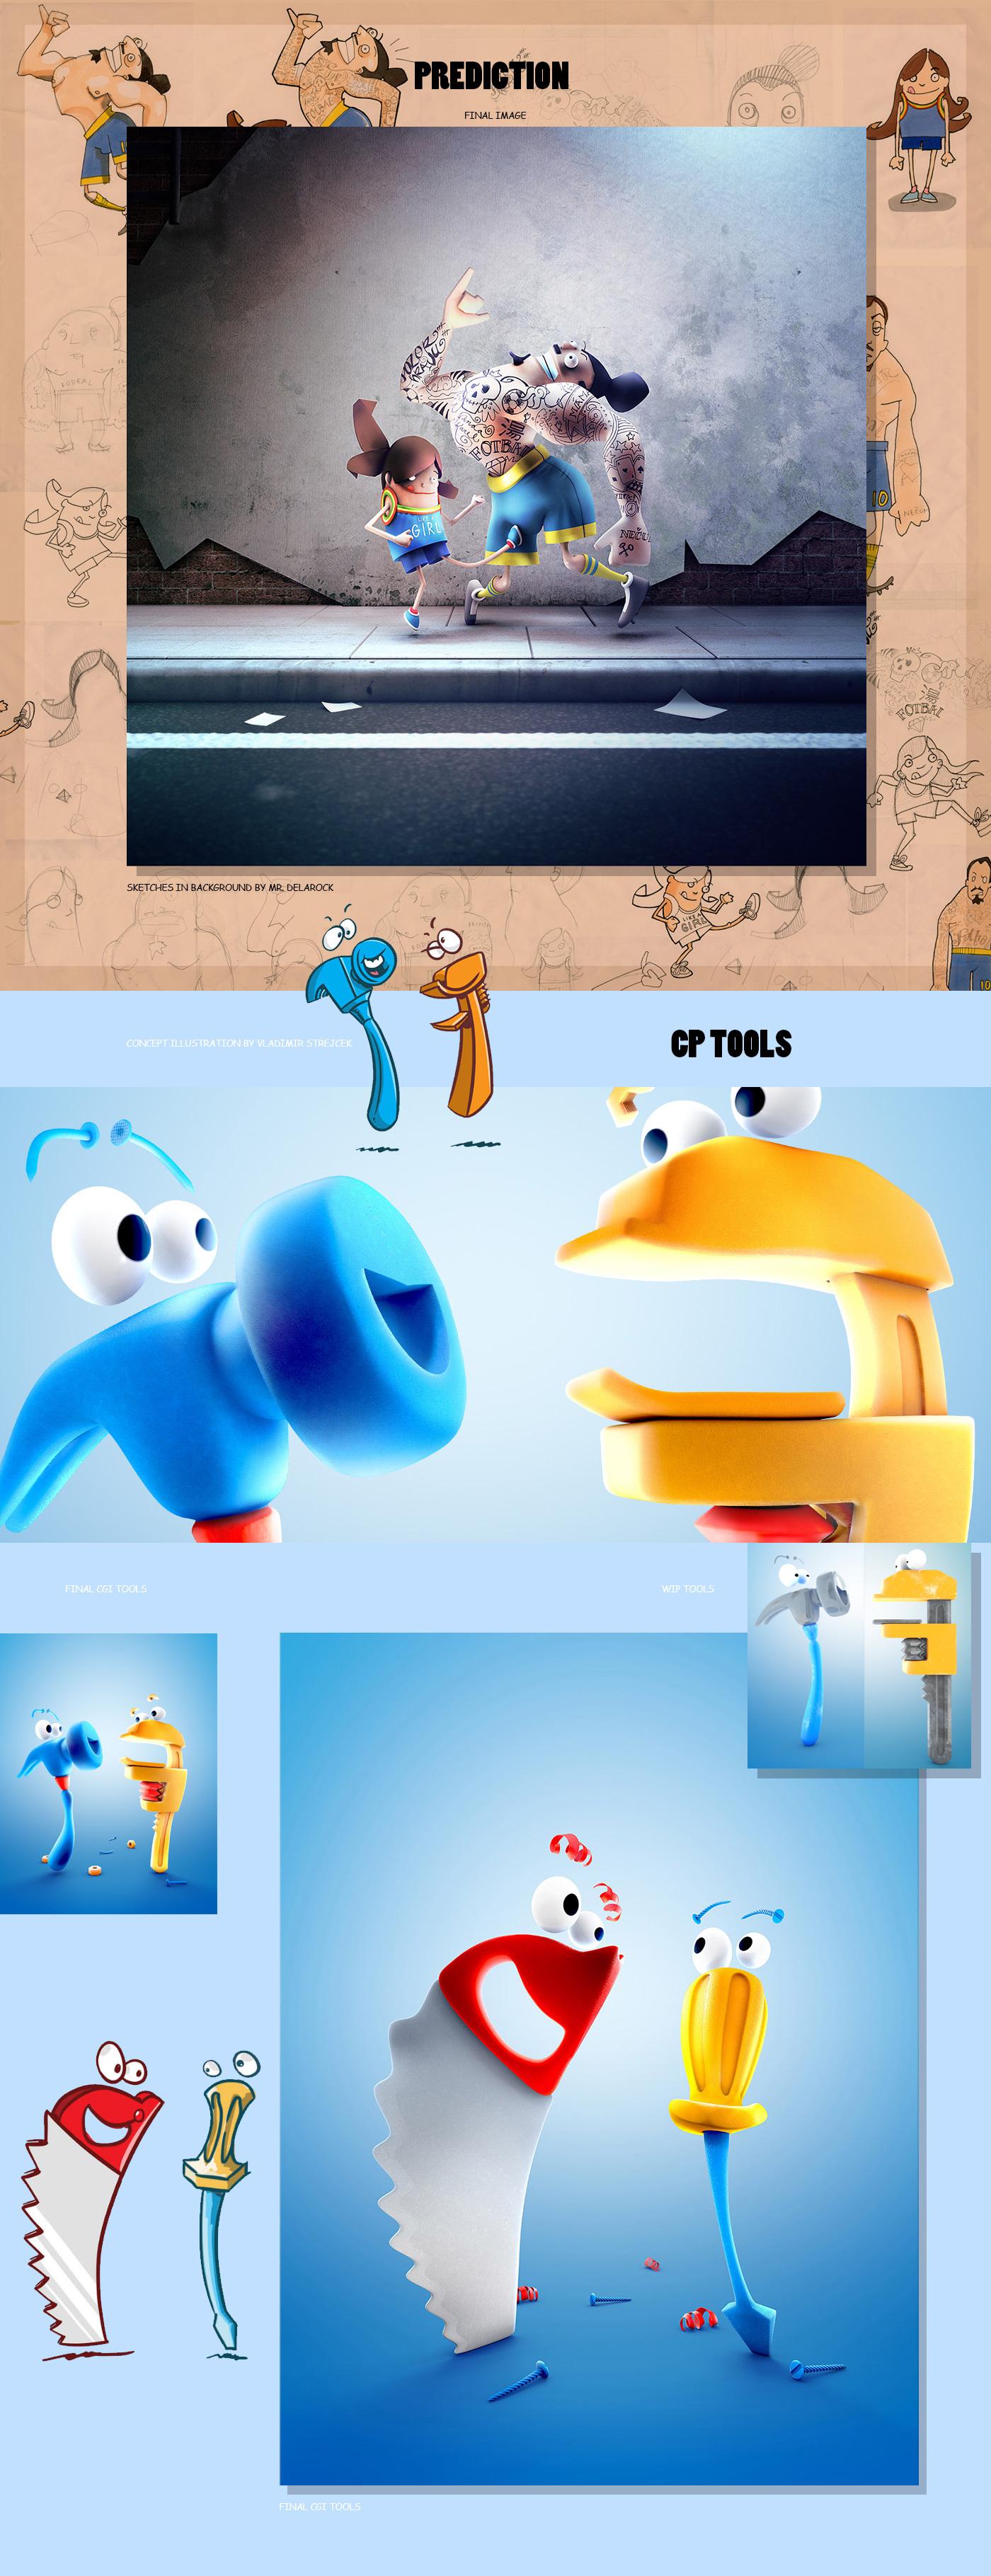 cartoon color toys robots Cartooning  Food  tools skate sketch snowman